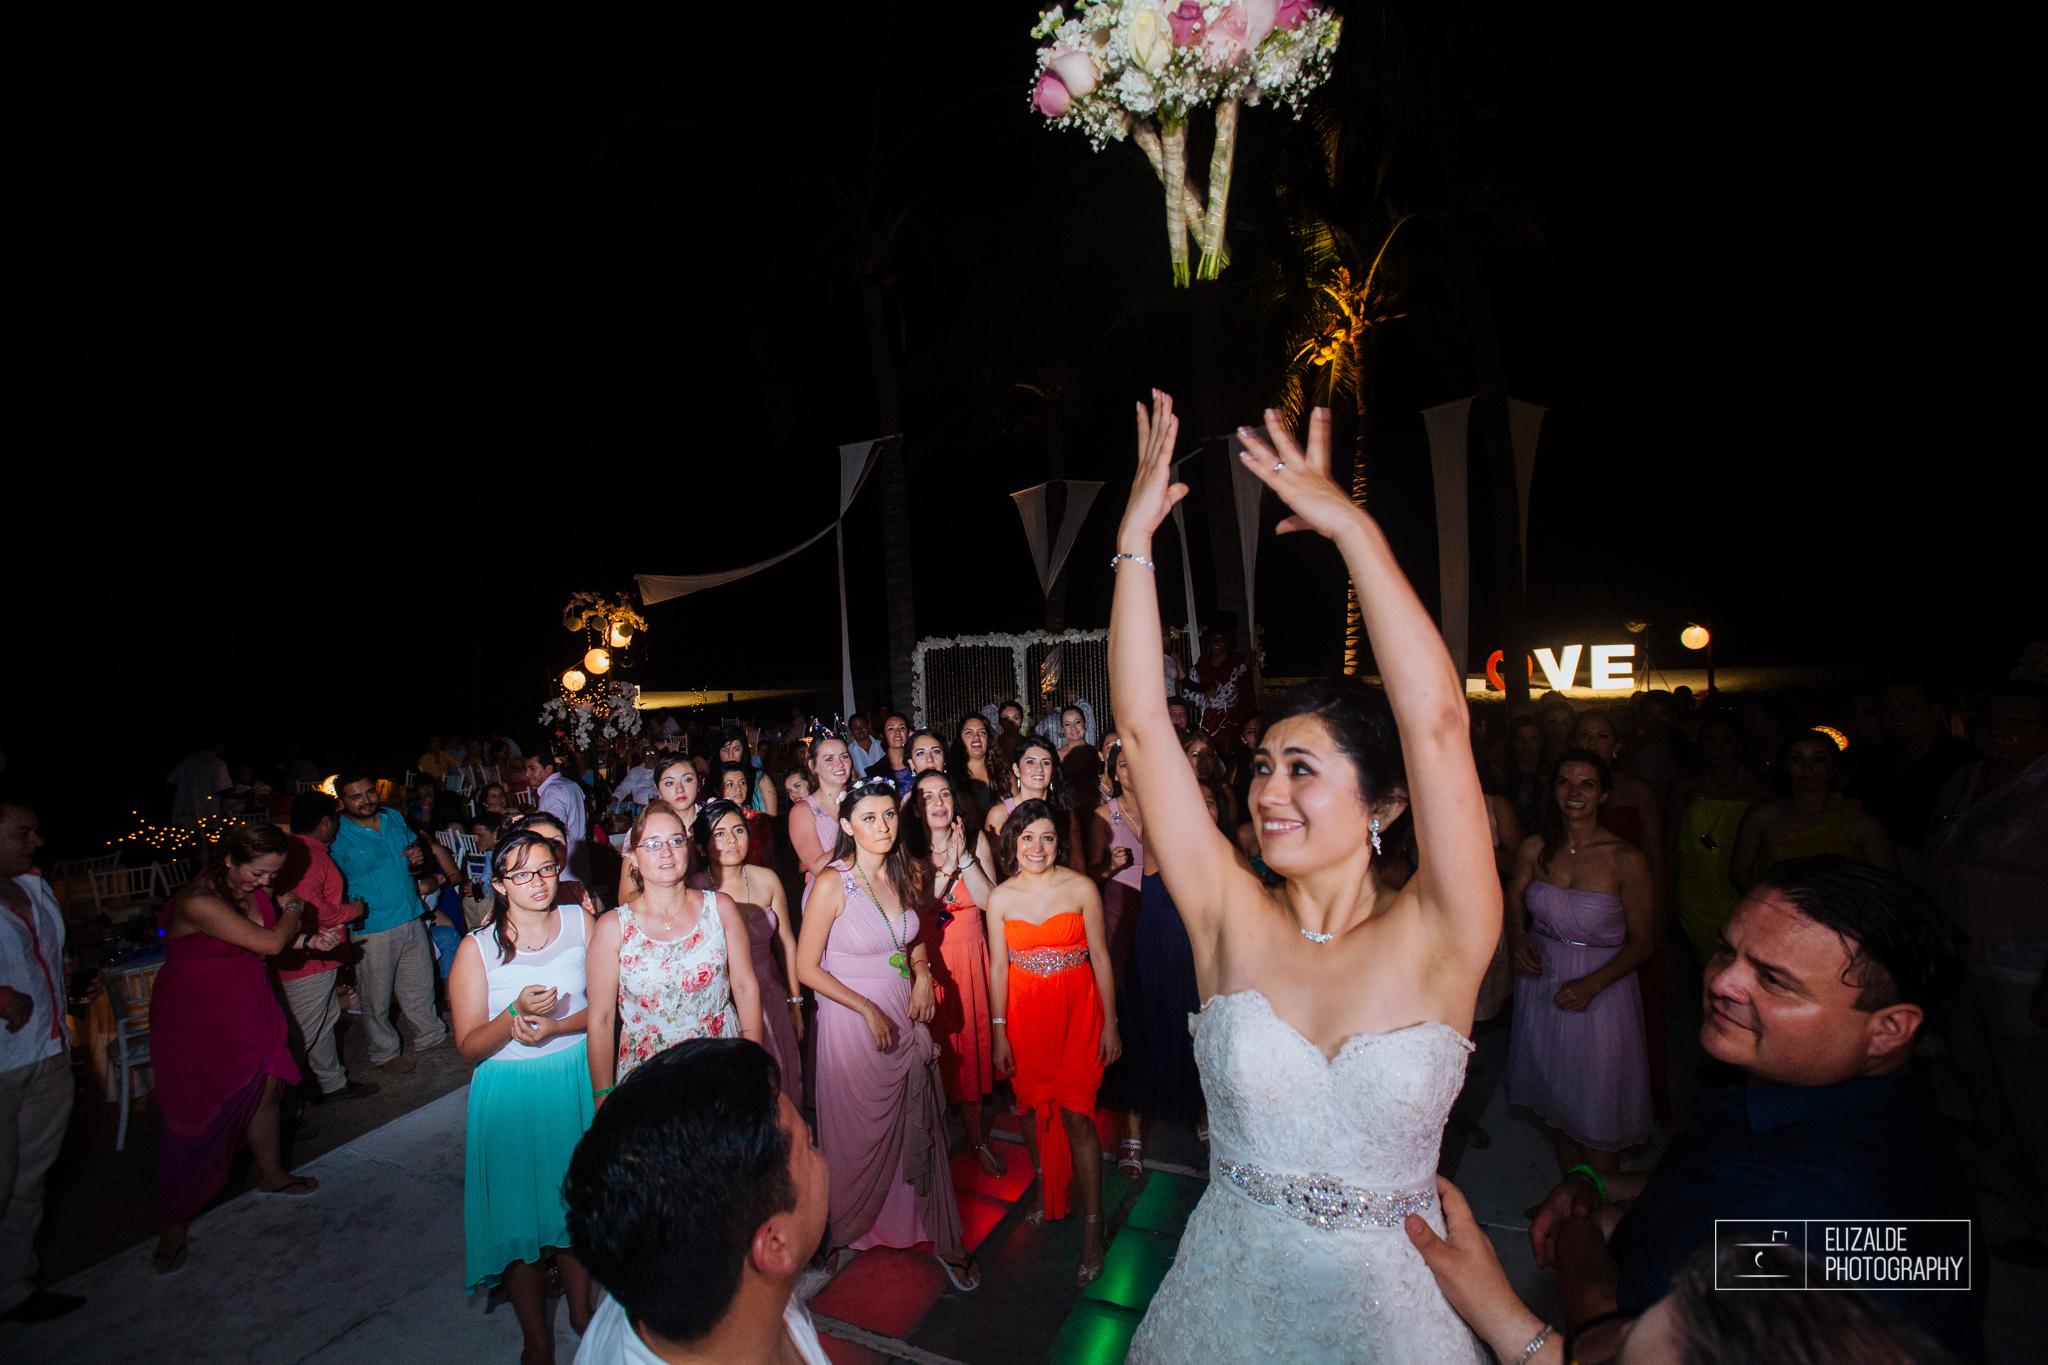 Pay and Ferran_Acapulco_Destination Wedding_Elizalde Photography-178.jpg